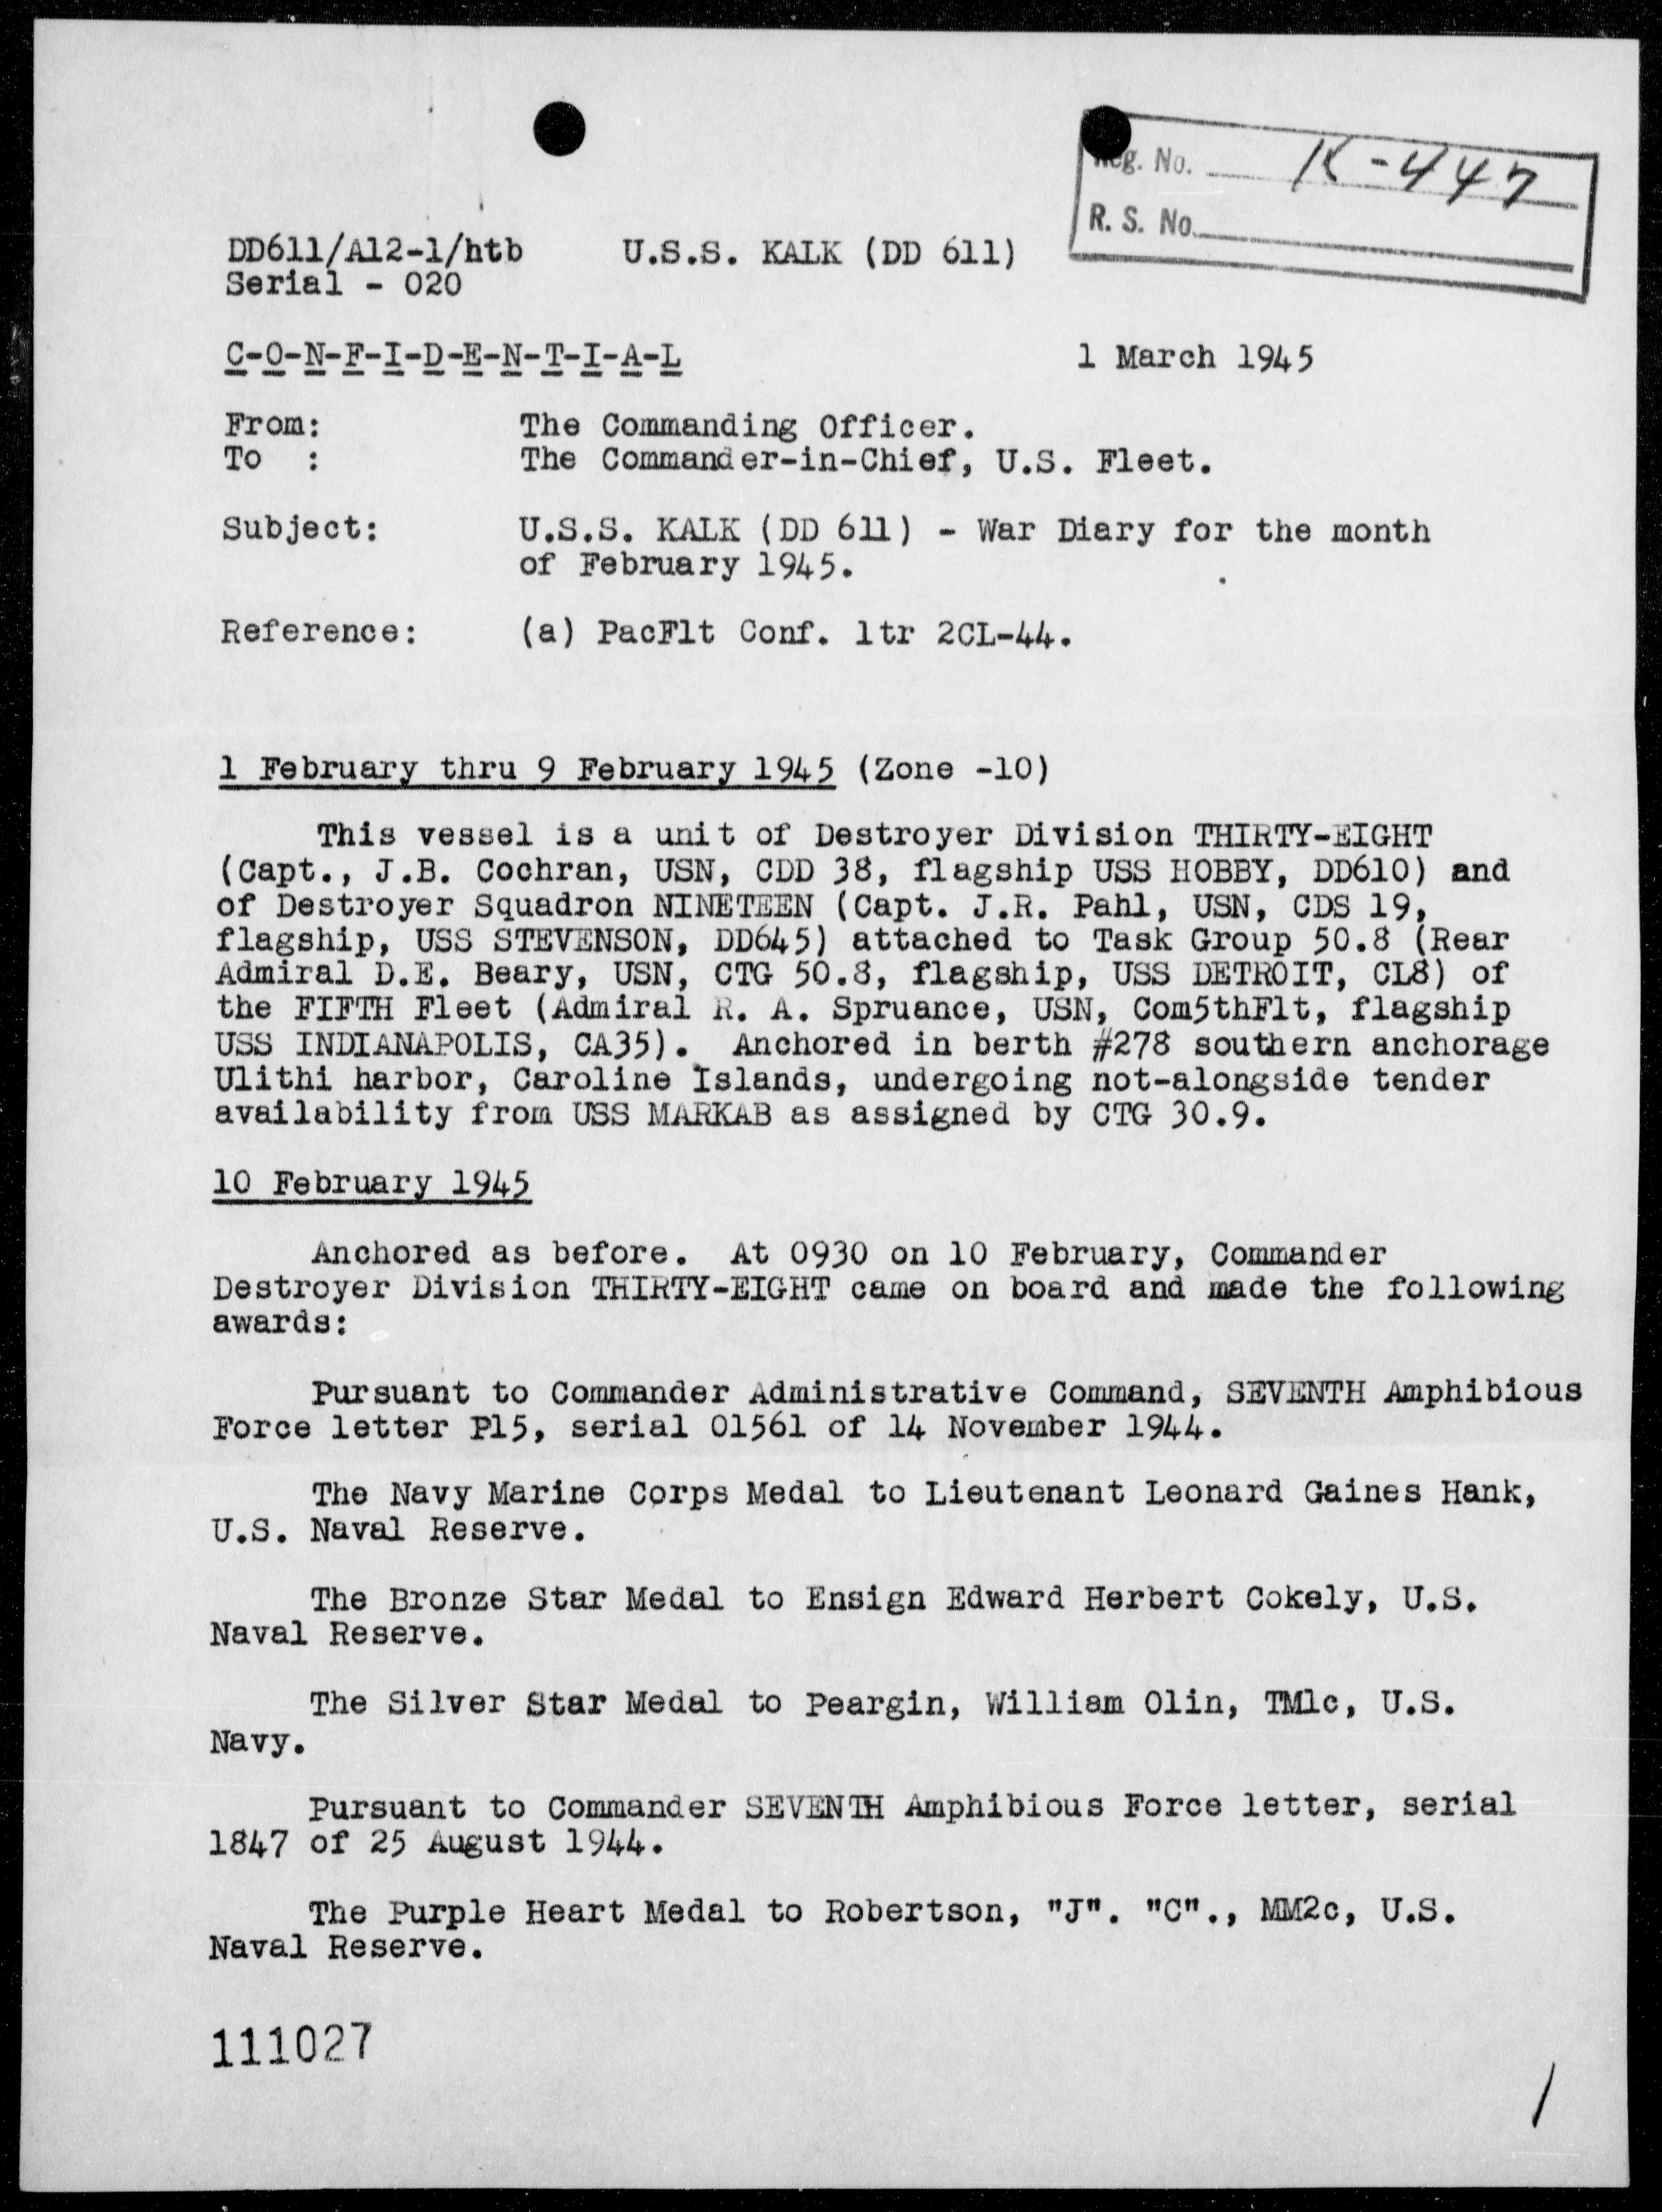 USS KALK - War Diary, 2/1-28/45